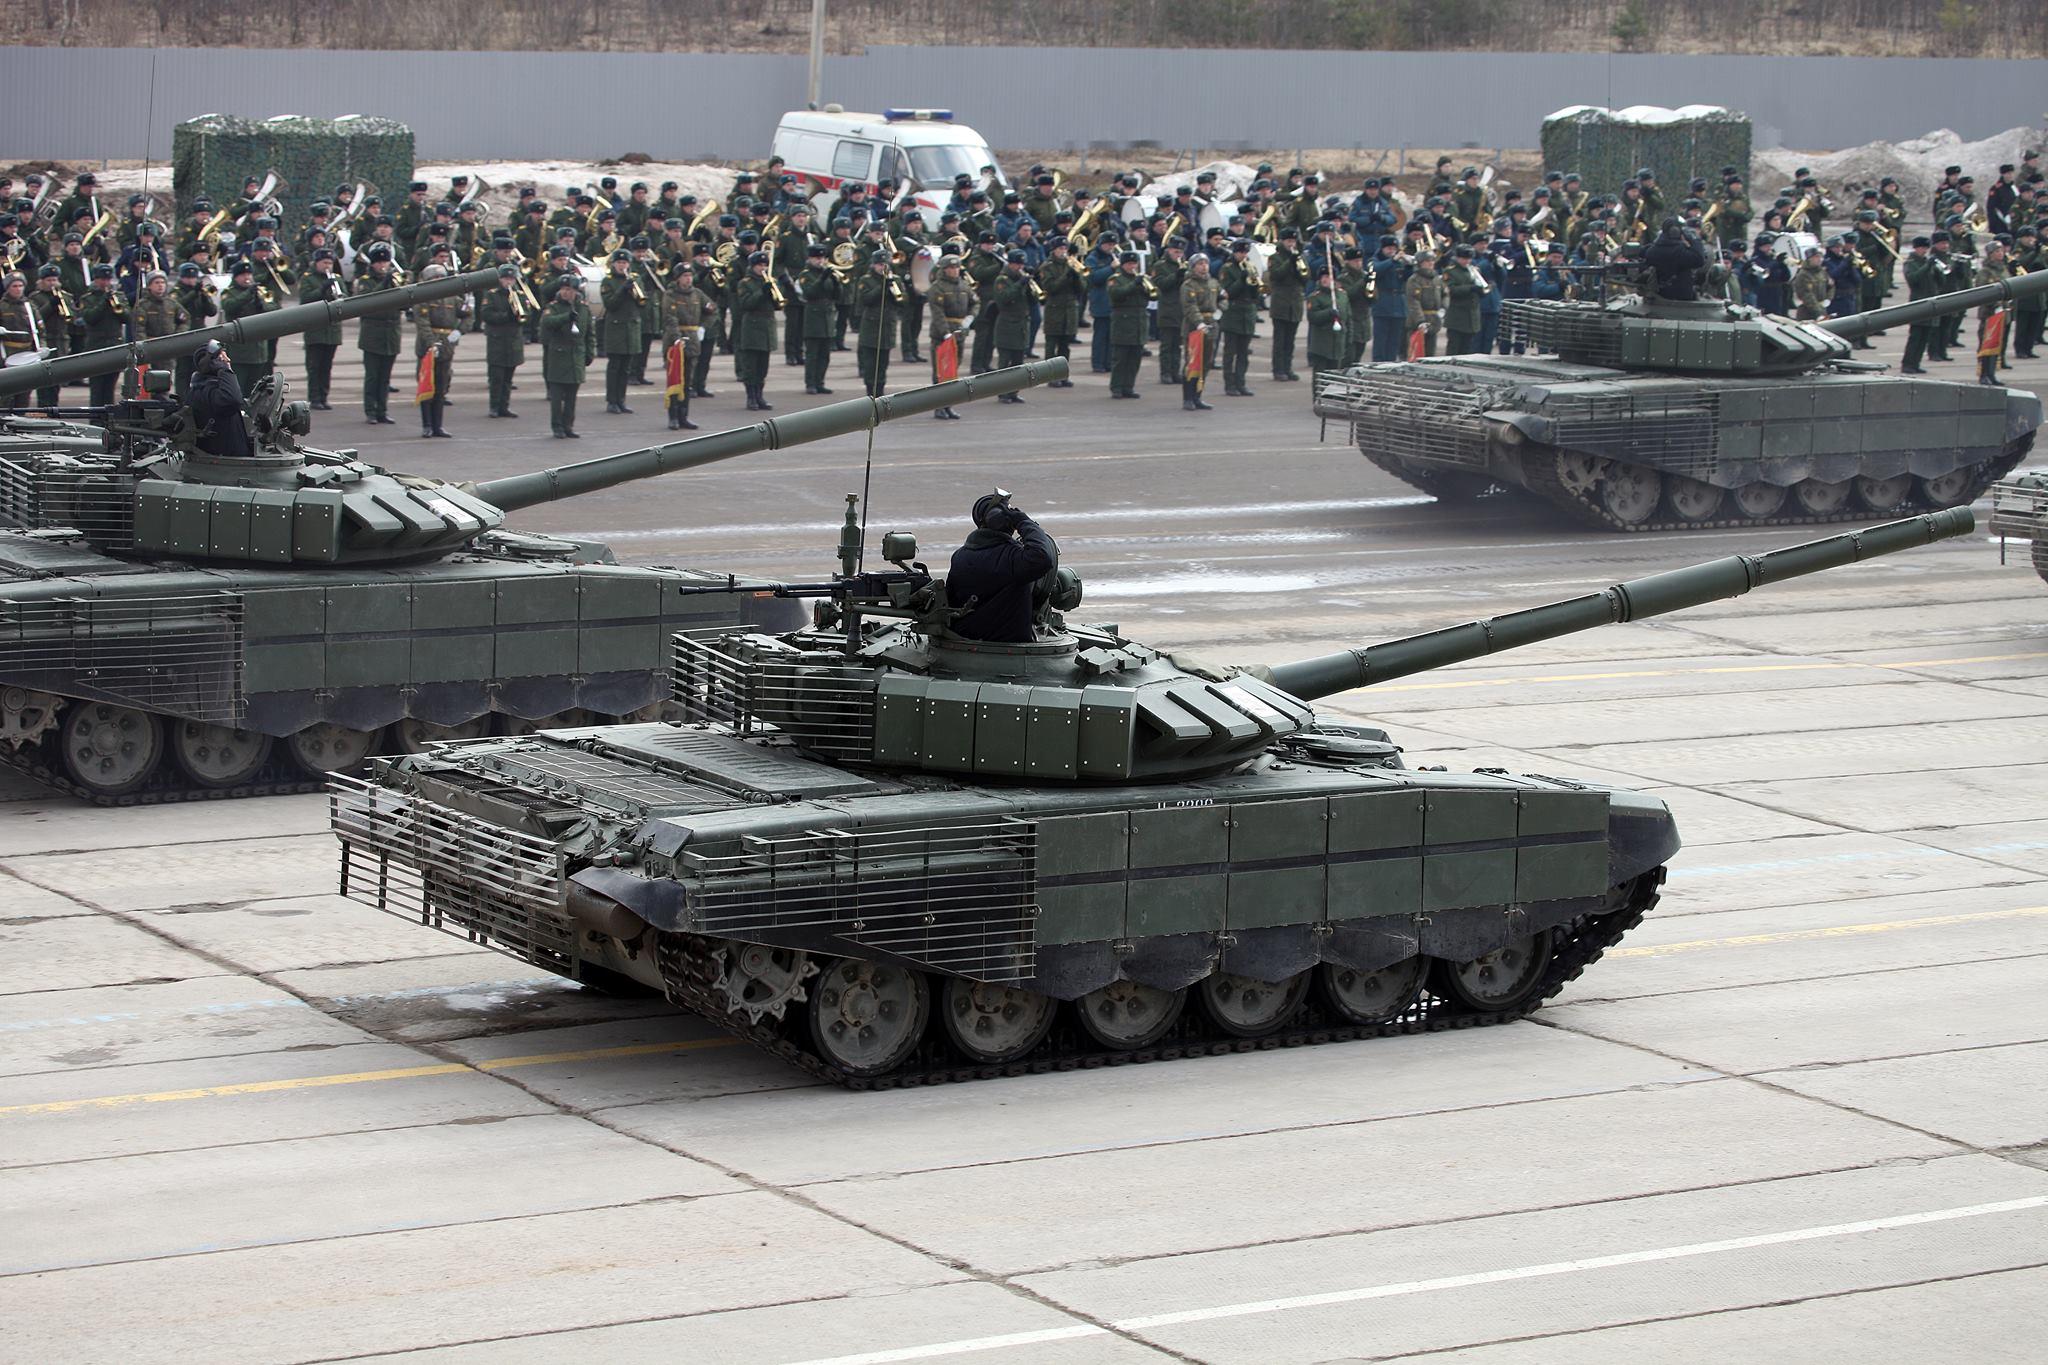 T-72 ΜΒΤ modernisation and variants - Page 15 4070878_original